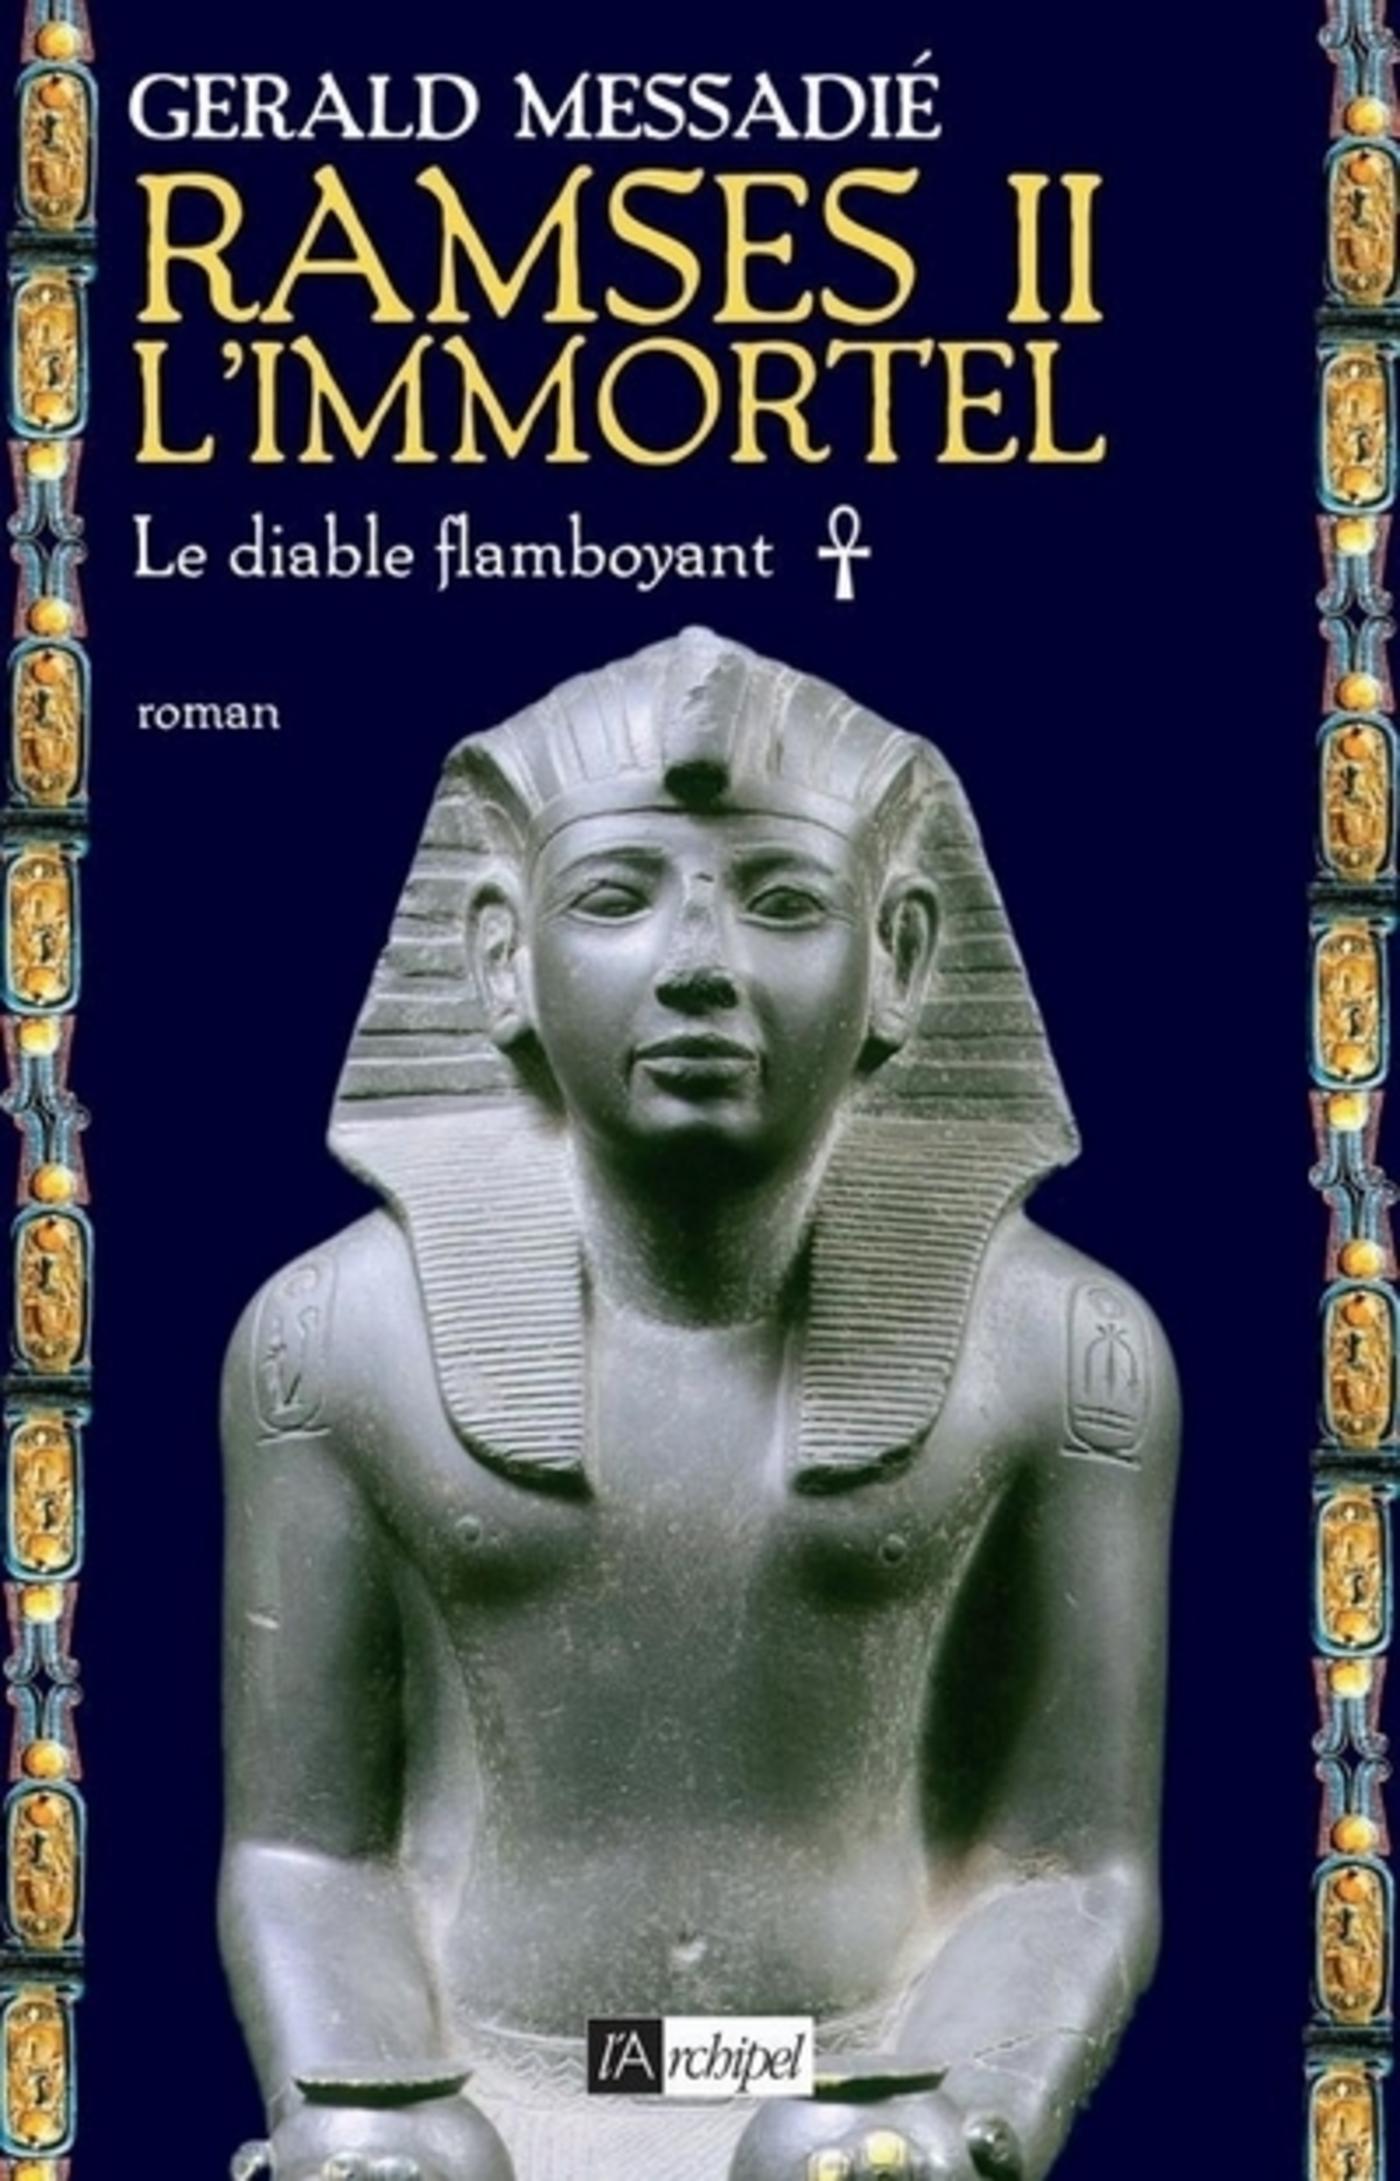 Ramsès II l'immortel - tome 1 Le diable flamboyant